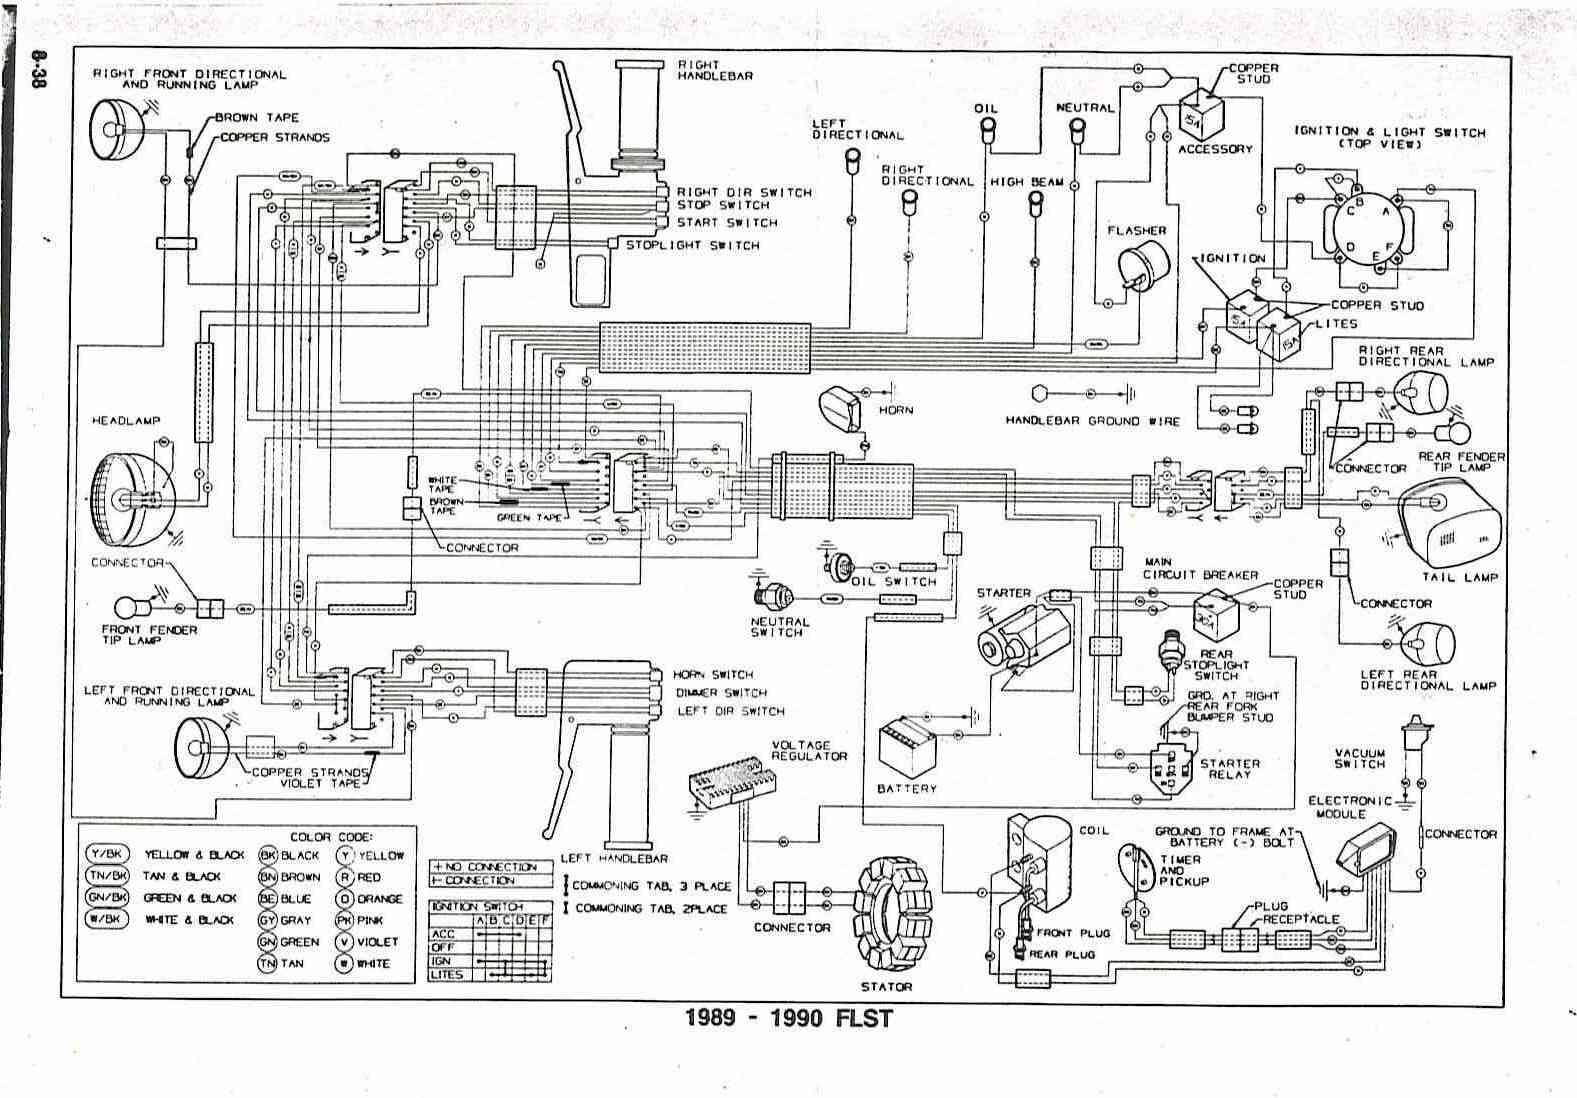 bridgeport wiring diagram fg 4684  harley starter wire schematic wiring diagram  harley starter wire schematic wiring